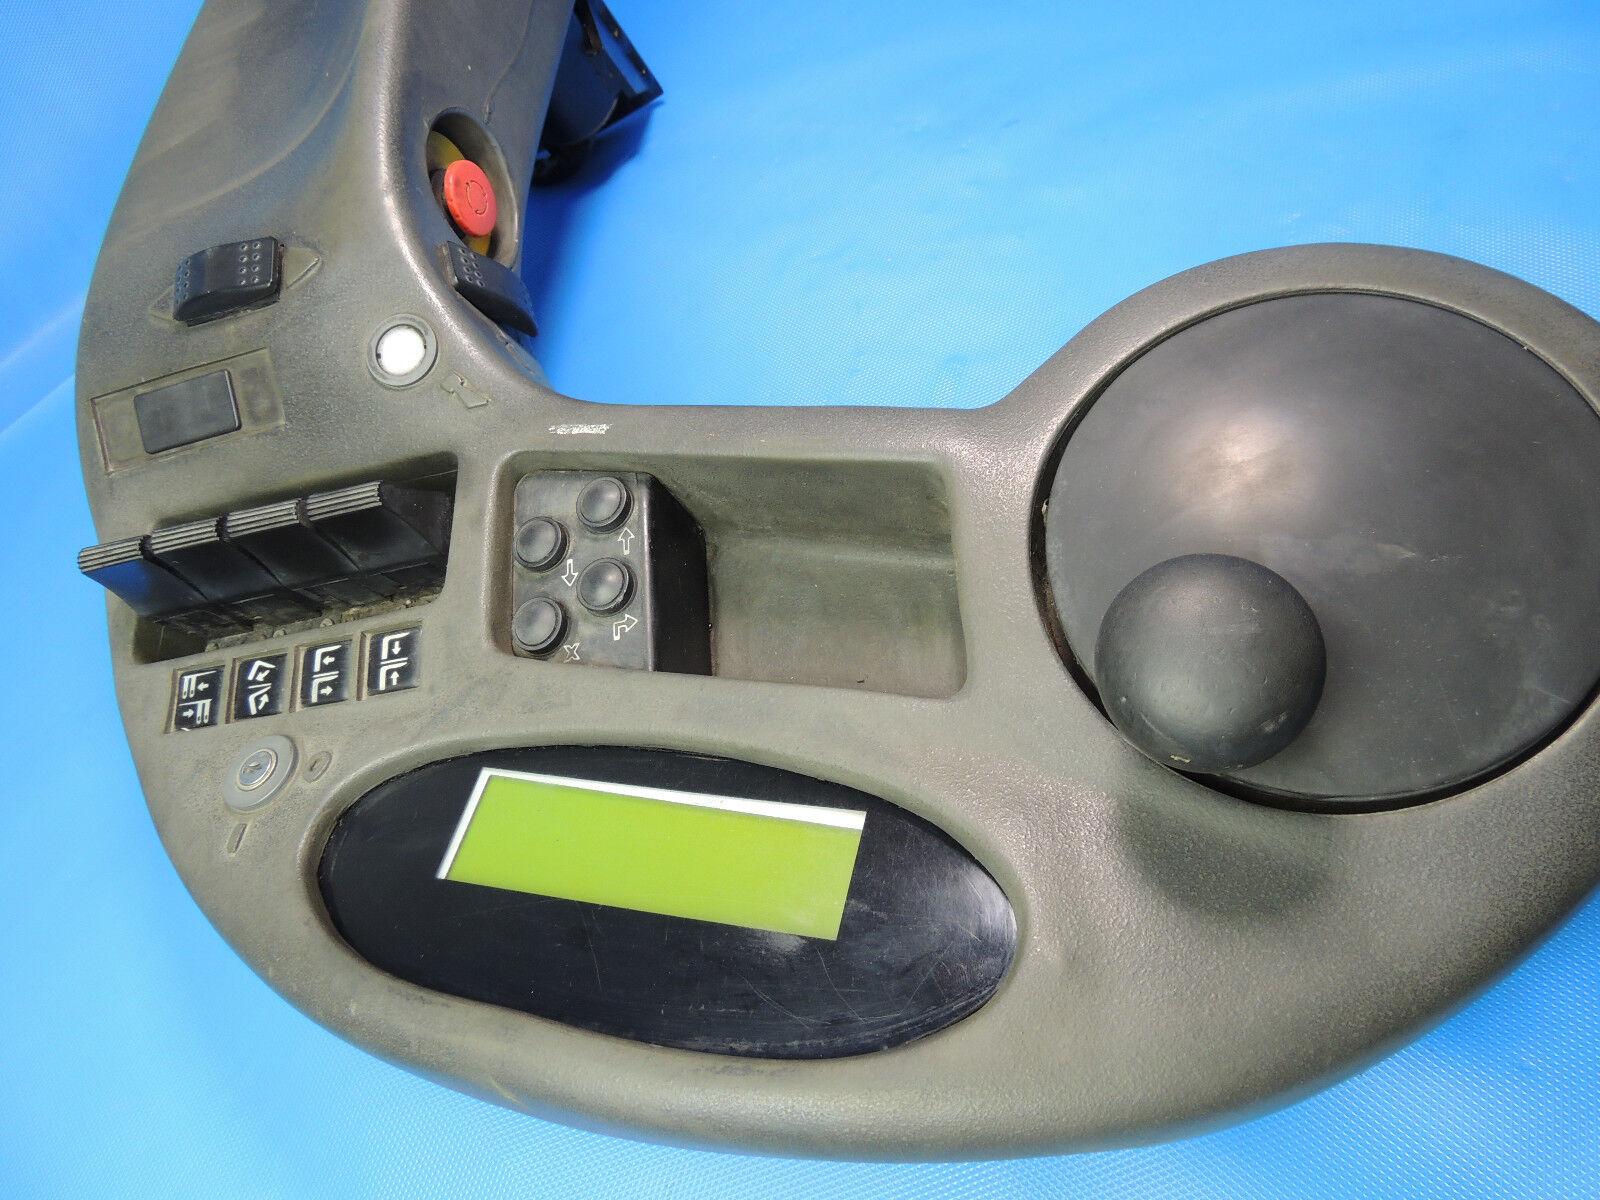 Fahrschalter pilotage pilotage pilotage hubameise Élément de commande Incl. TVA. 113ac6